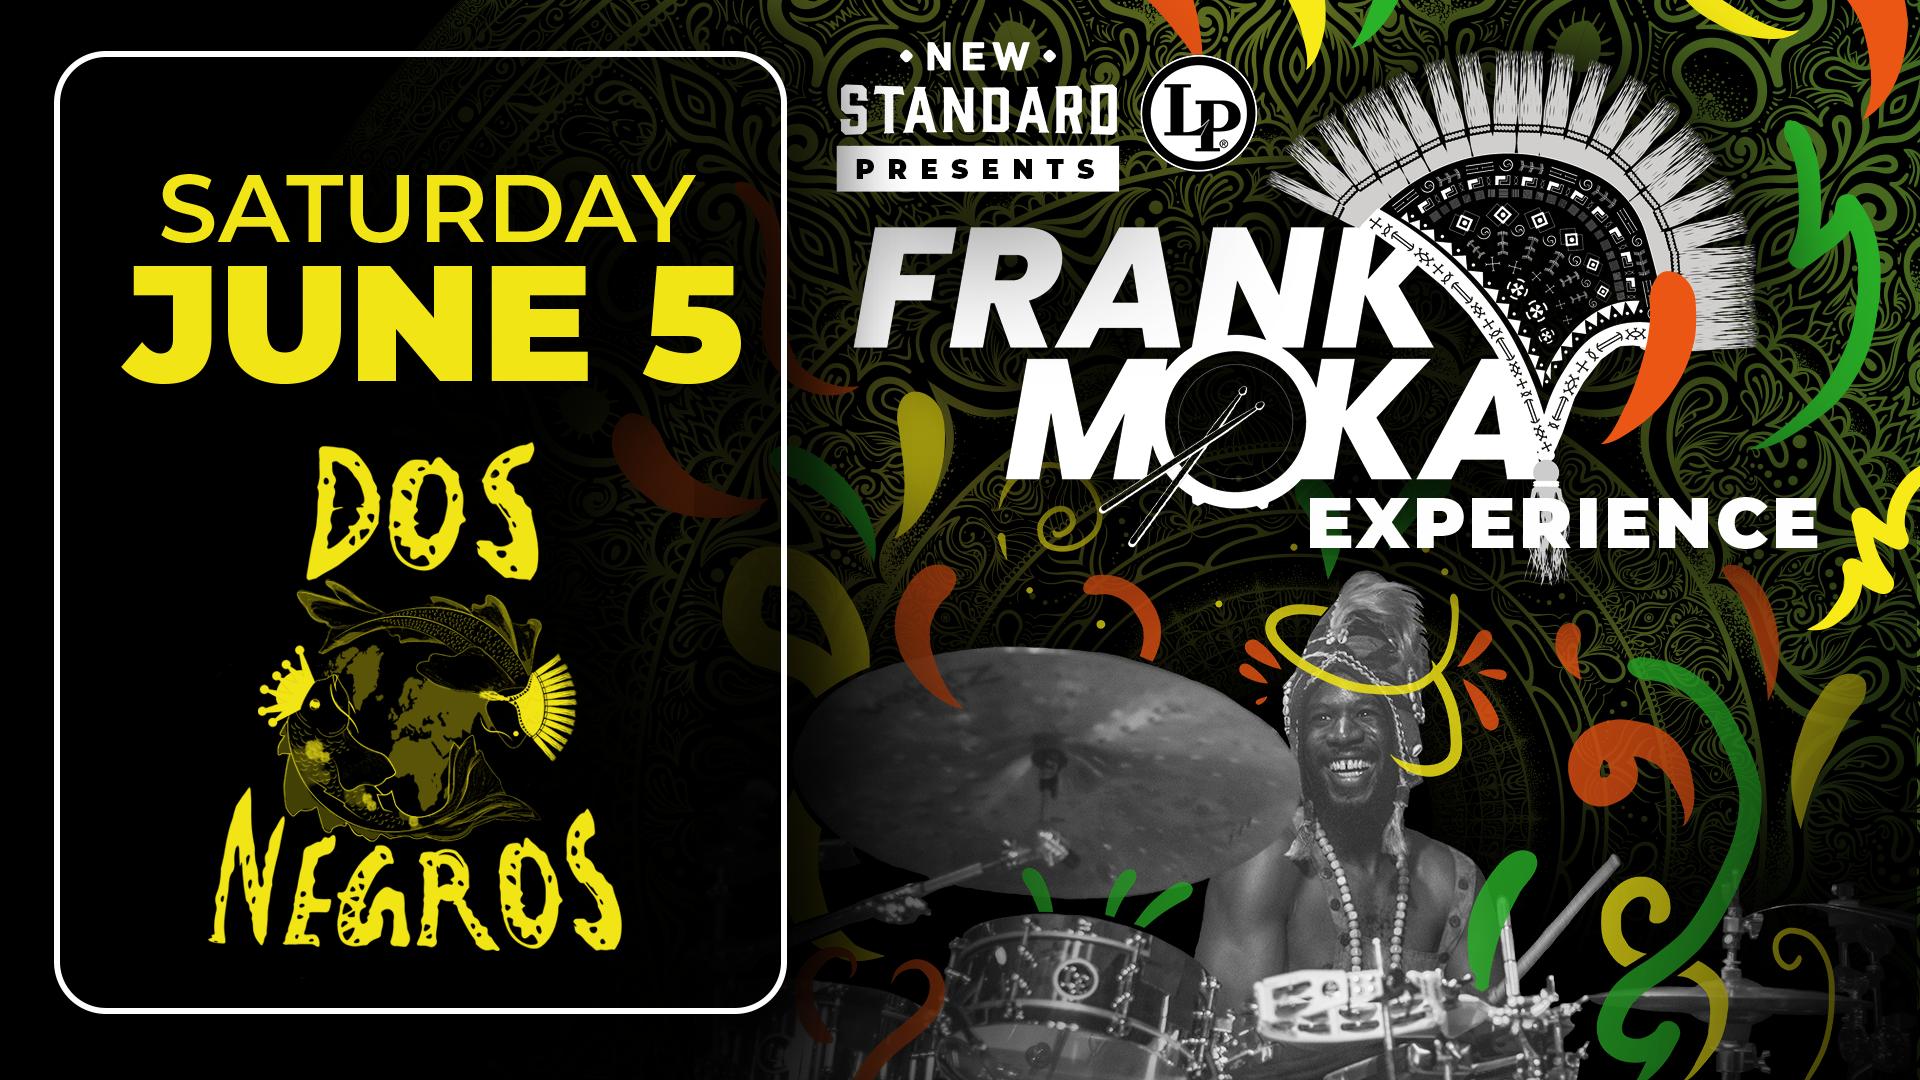 Photo for Frank Moka Experience - June 4 & 5, 2021 - The New Standard, Winter Park, FL on ViewStub